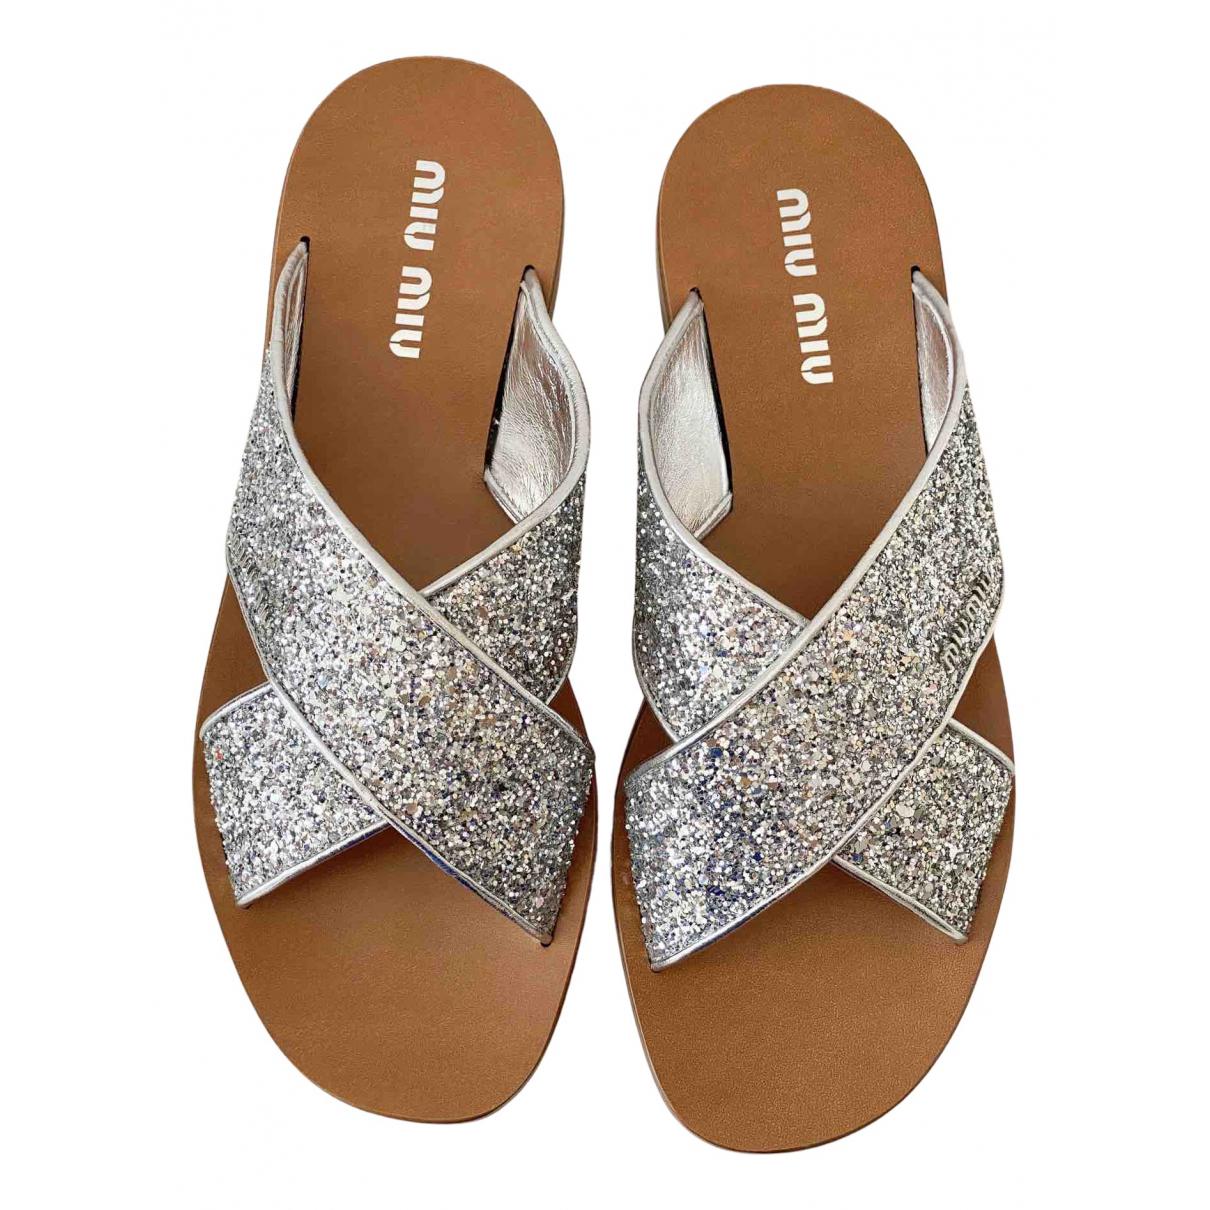 Miu Miu \N Sandalen in  Silber Mit Pailletten